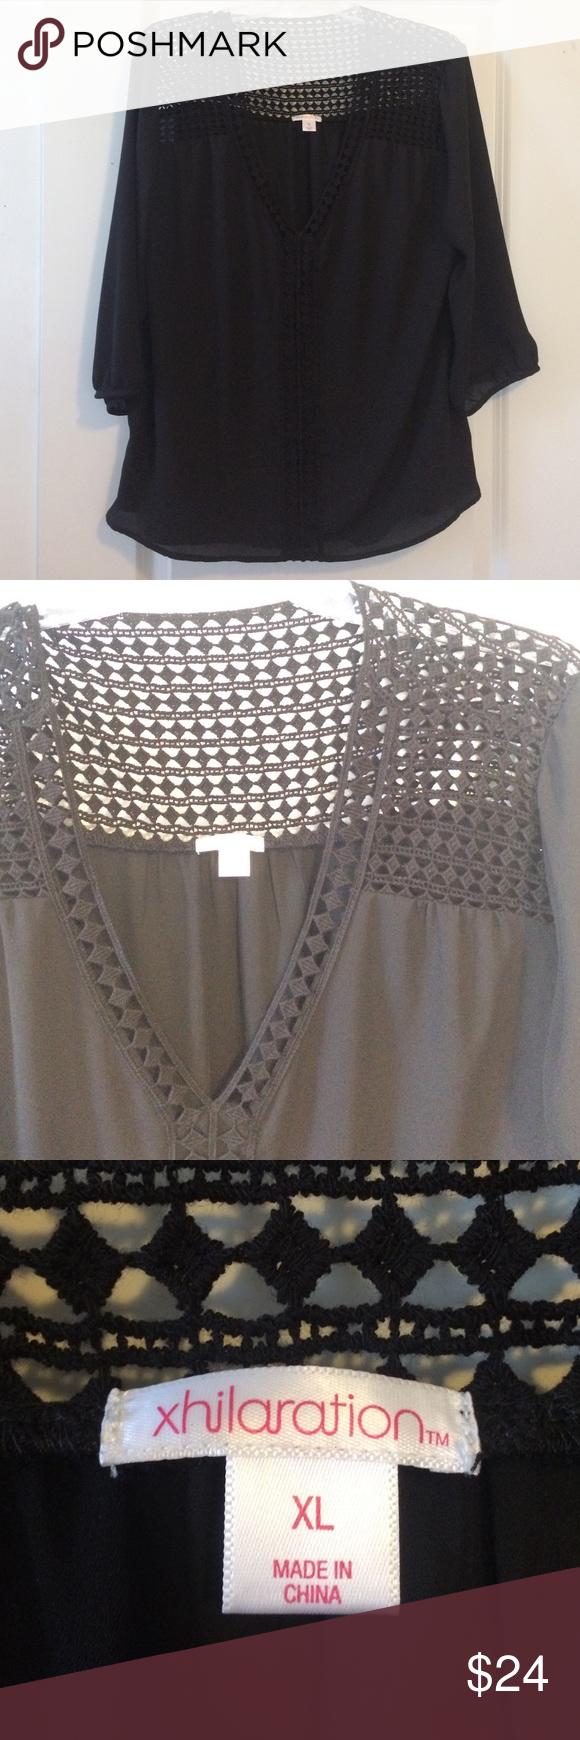 NWOT black v-neck blouse from Target NWOT black v-neck blouse from Target. Just did not fit me. Woven detail on the front and back! Xhilaration Tops Blouses